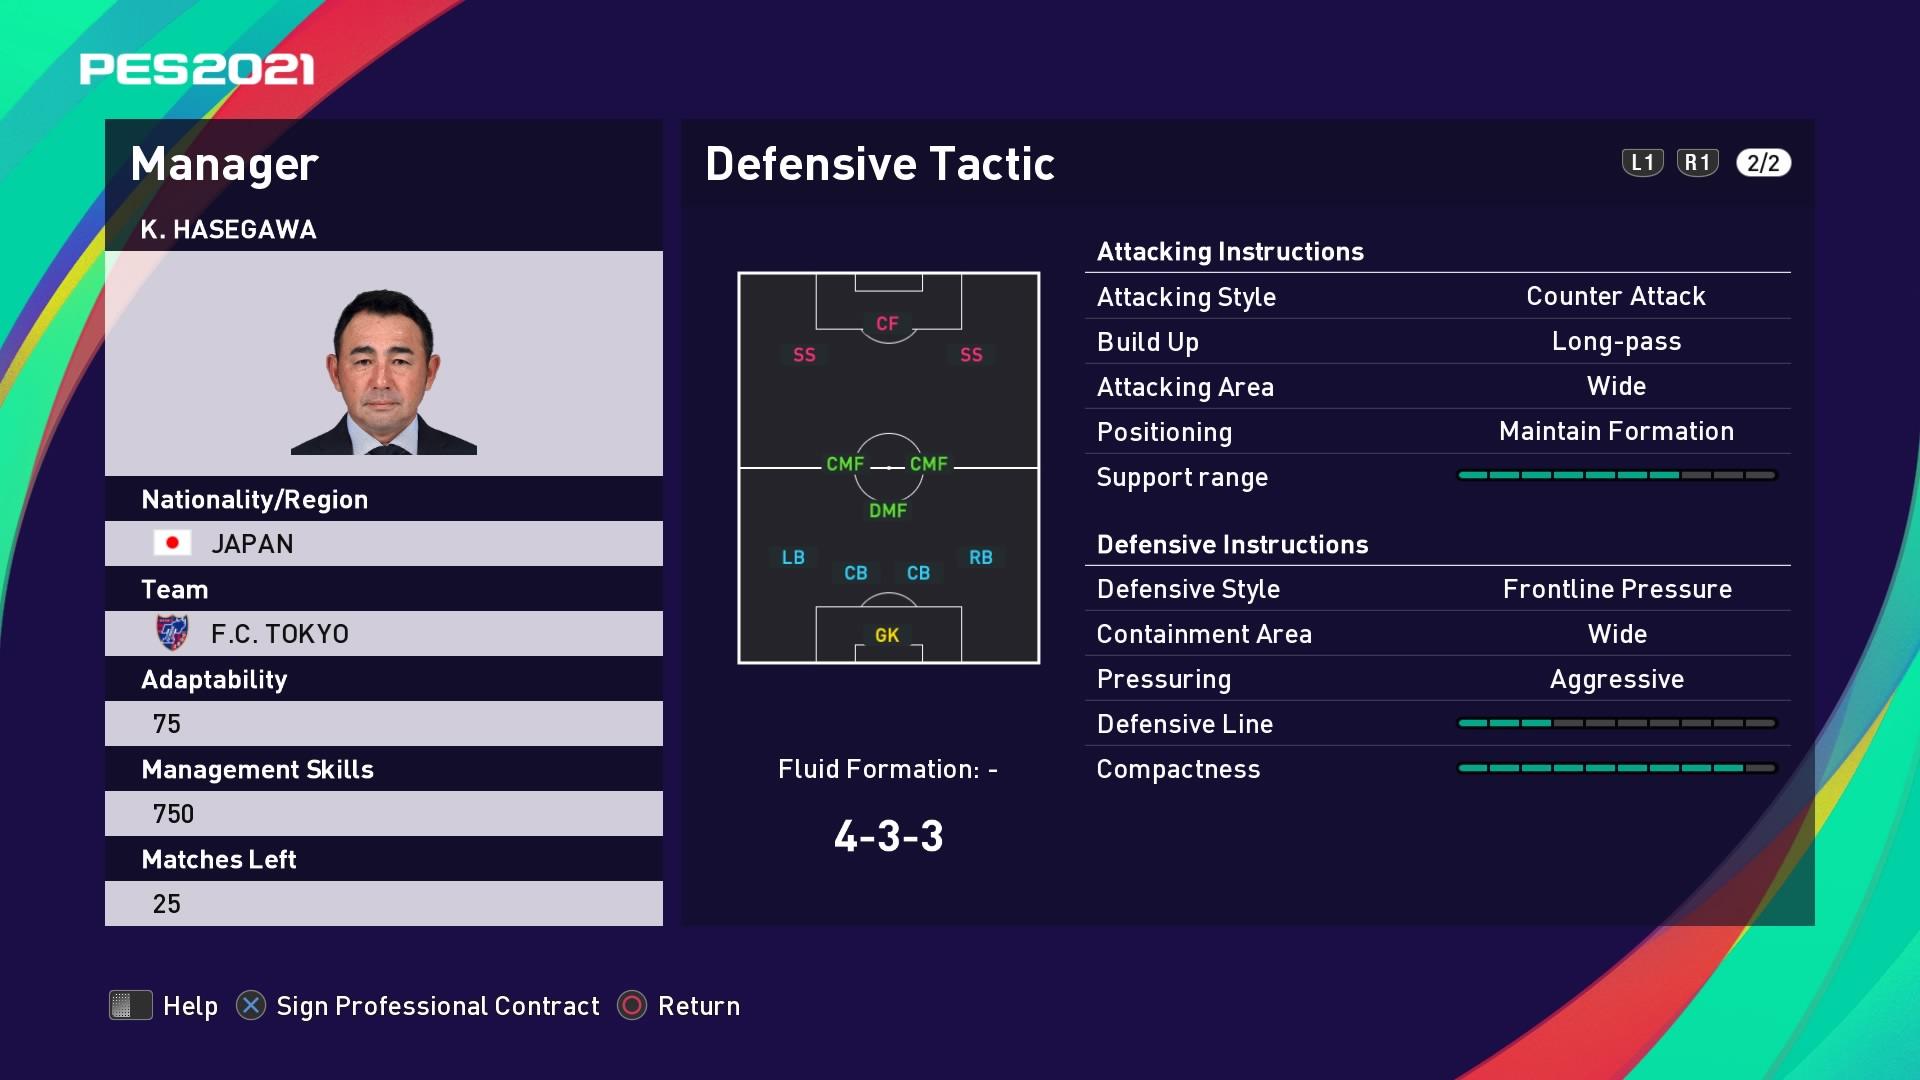 K. Hasegawa (Kenta Hasegawa) Defensive Tactic in PES 2021 myClub